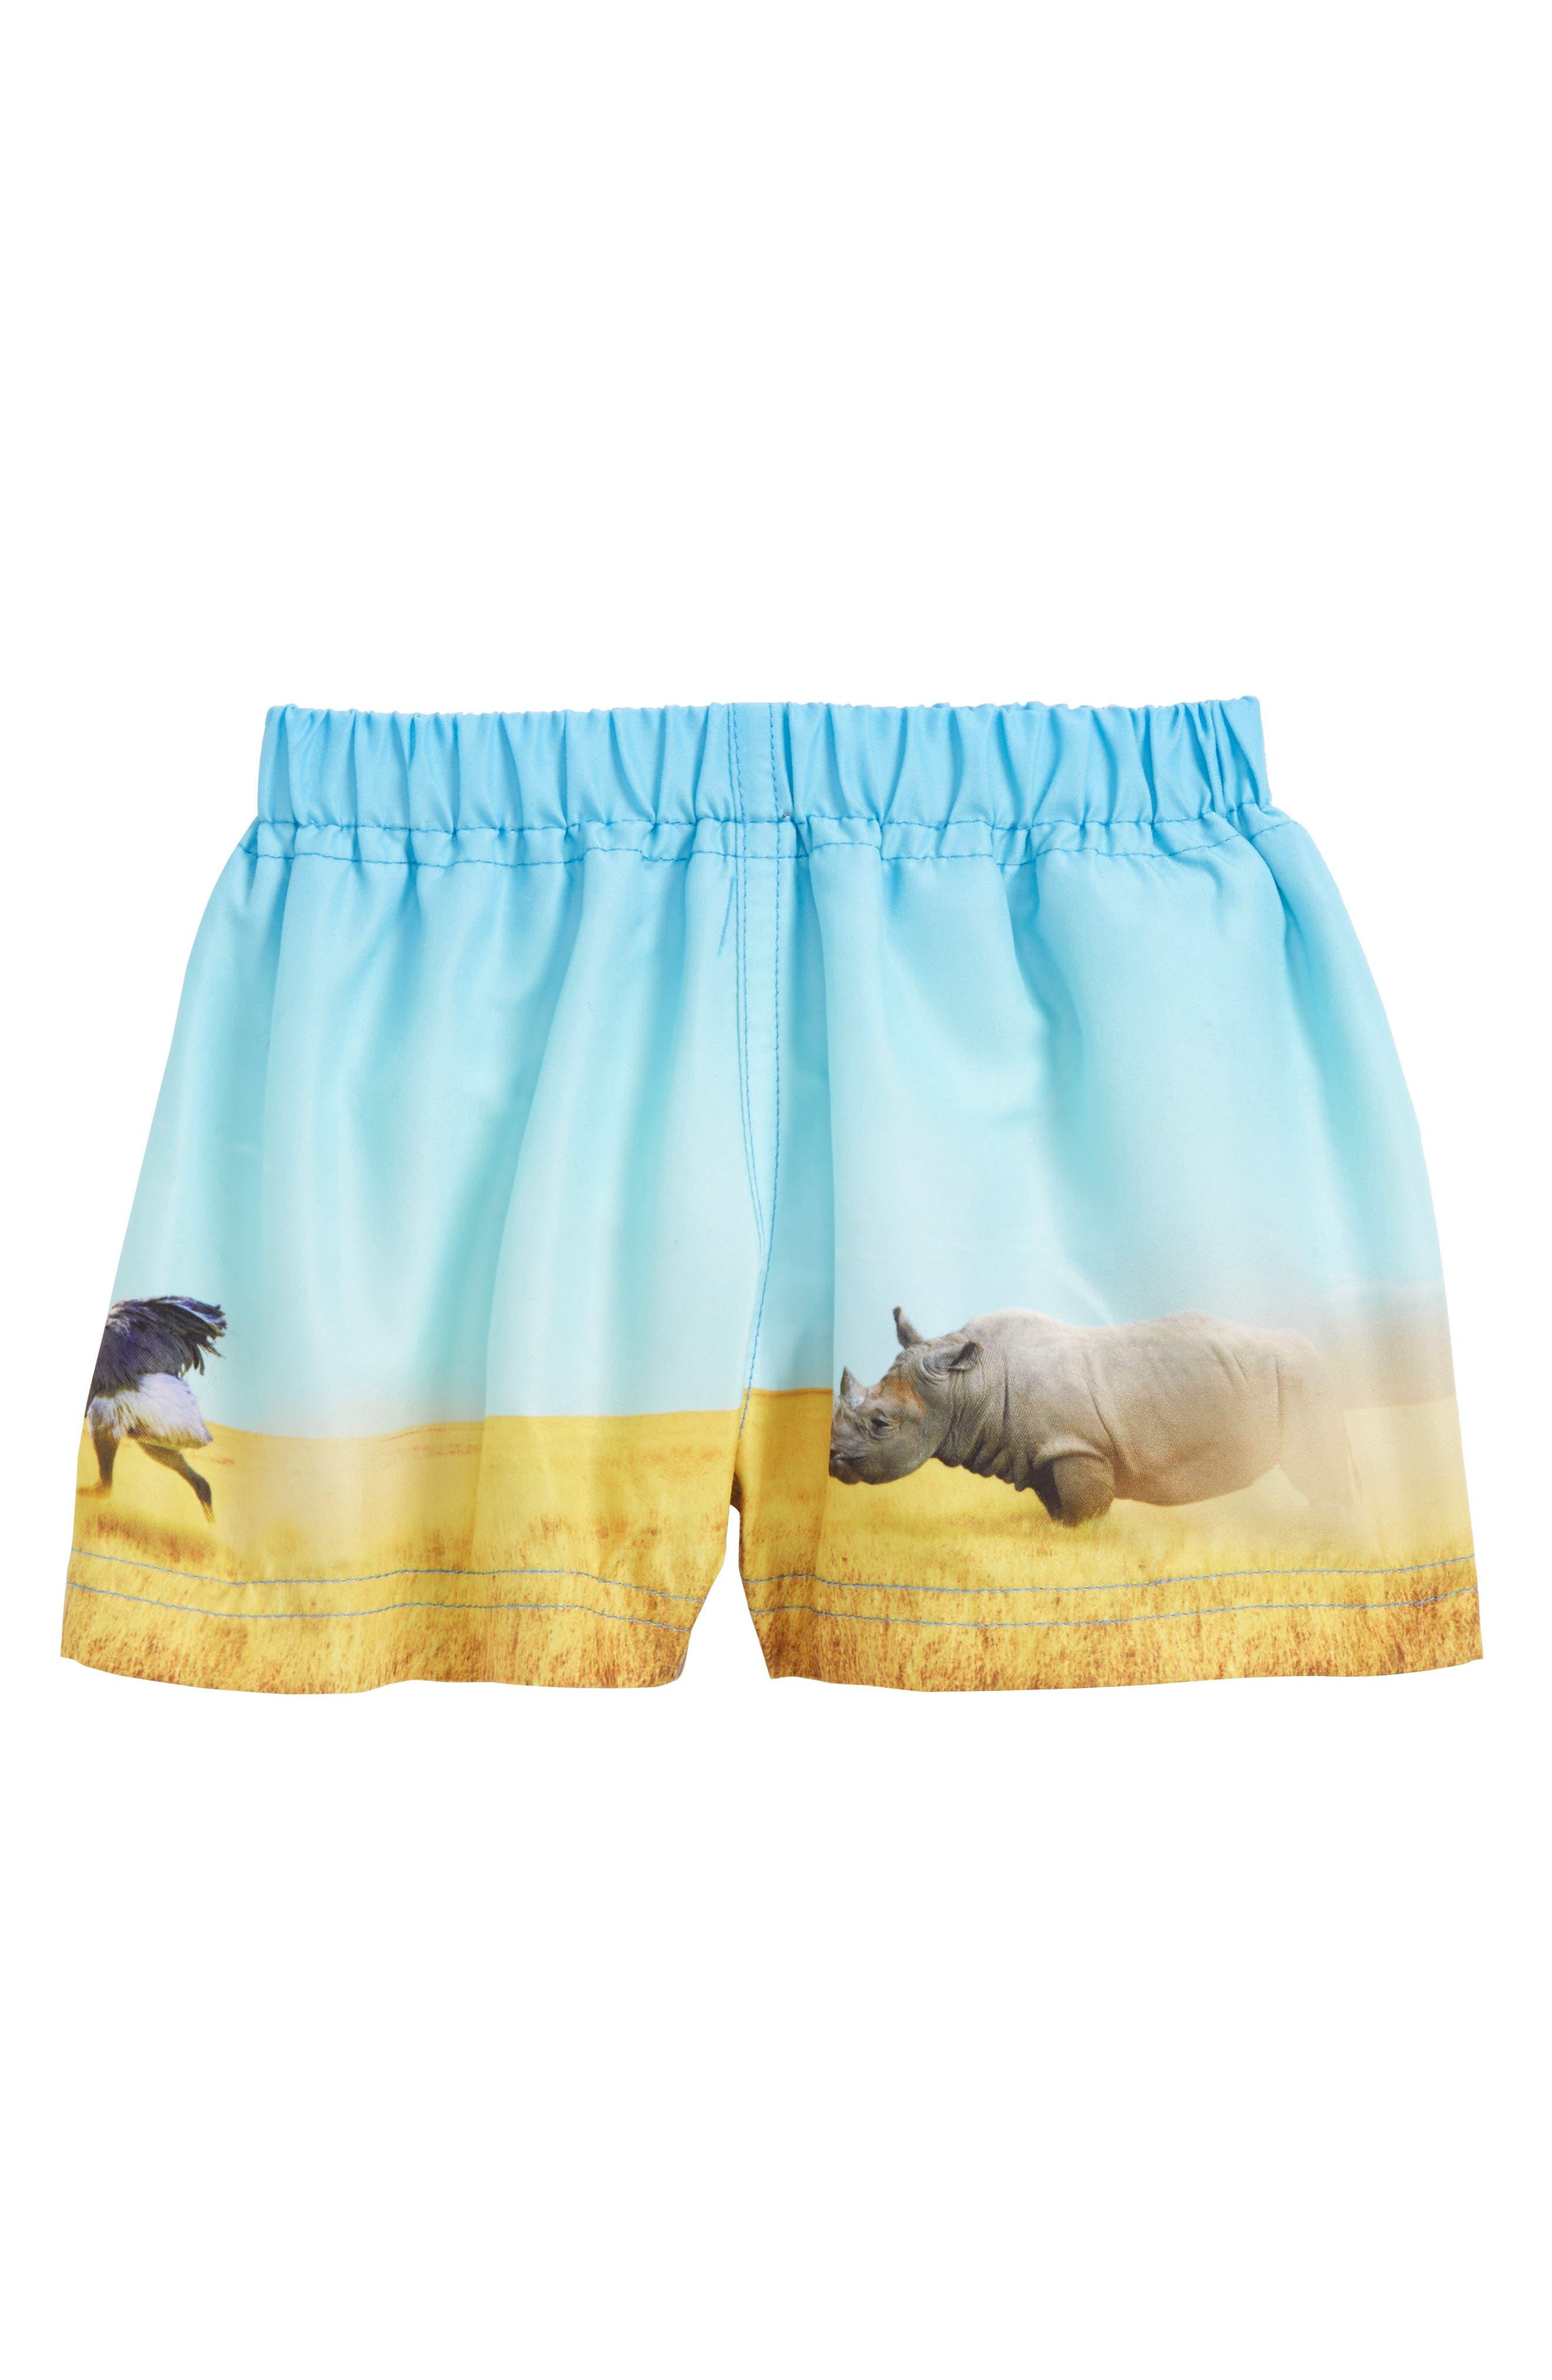 Alternate Image 1 Selected - Molo Newton Swim Trunks (Baby Boys)